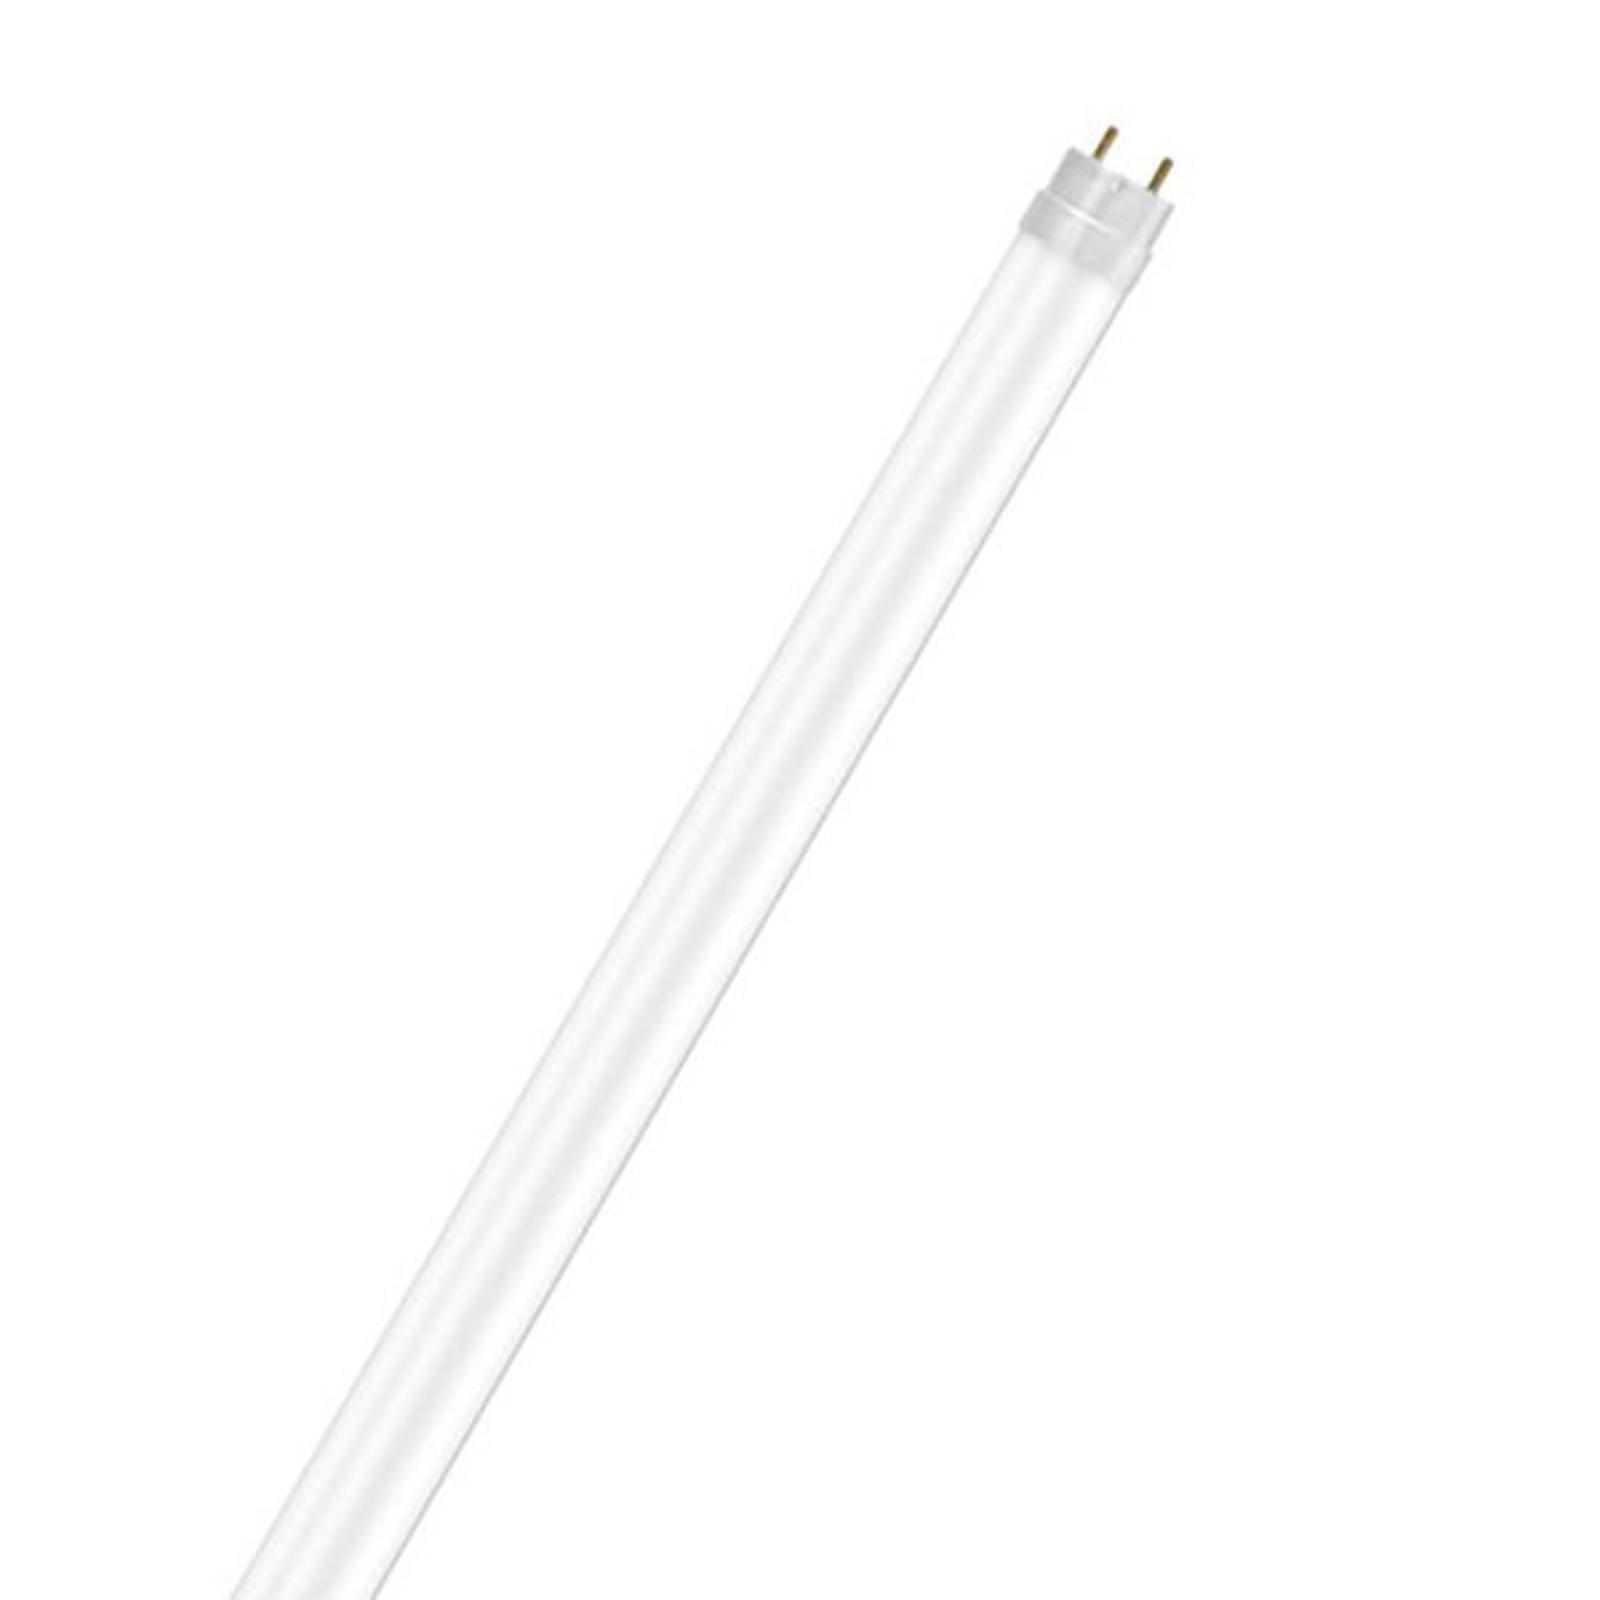 OSRAM LED-Röhre G13 150cm SubstiTUBE PC 18W 3000K